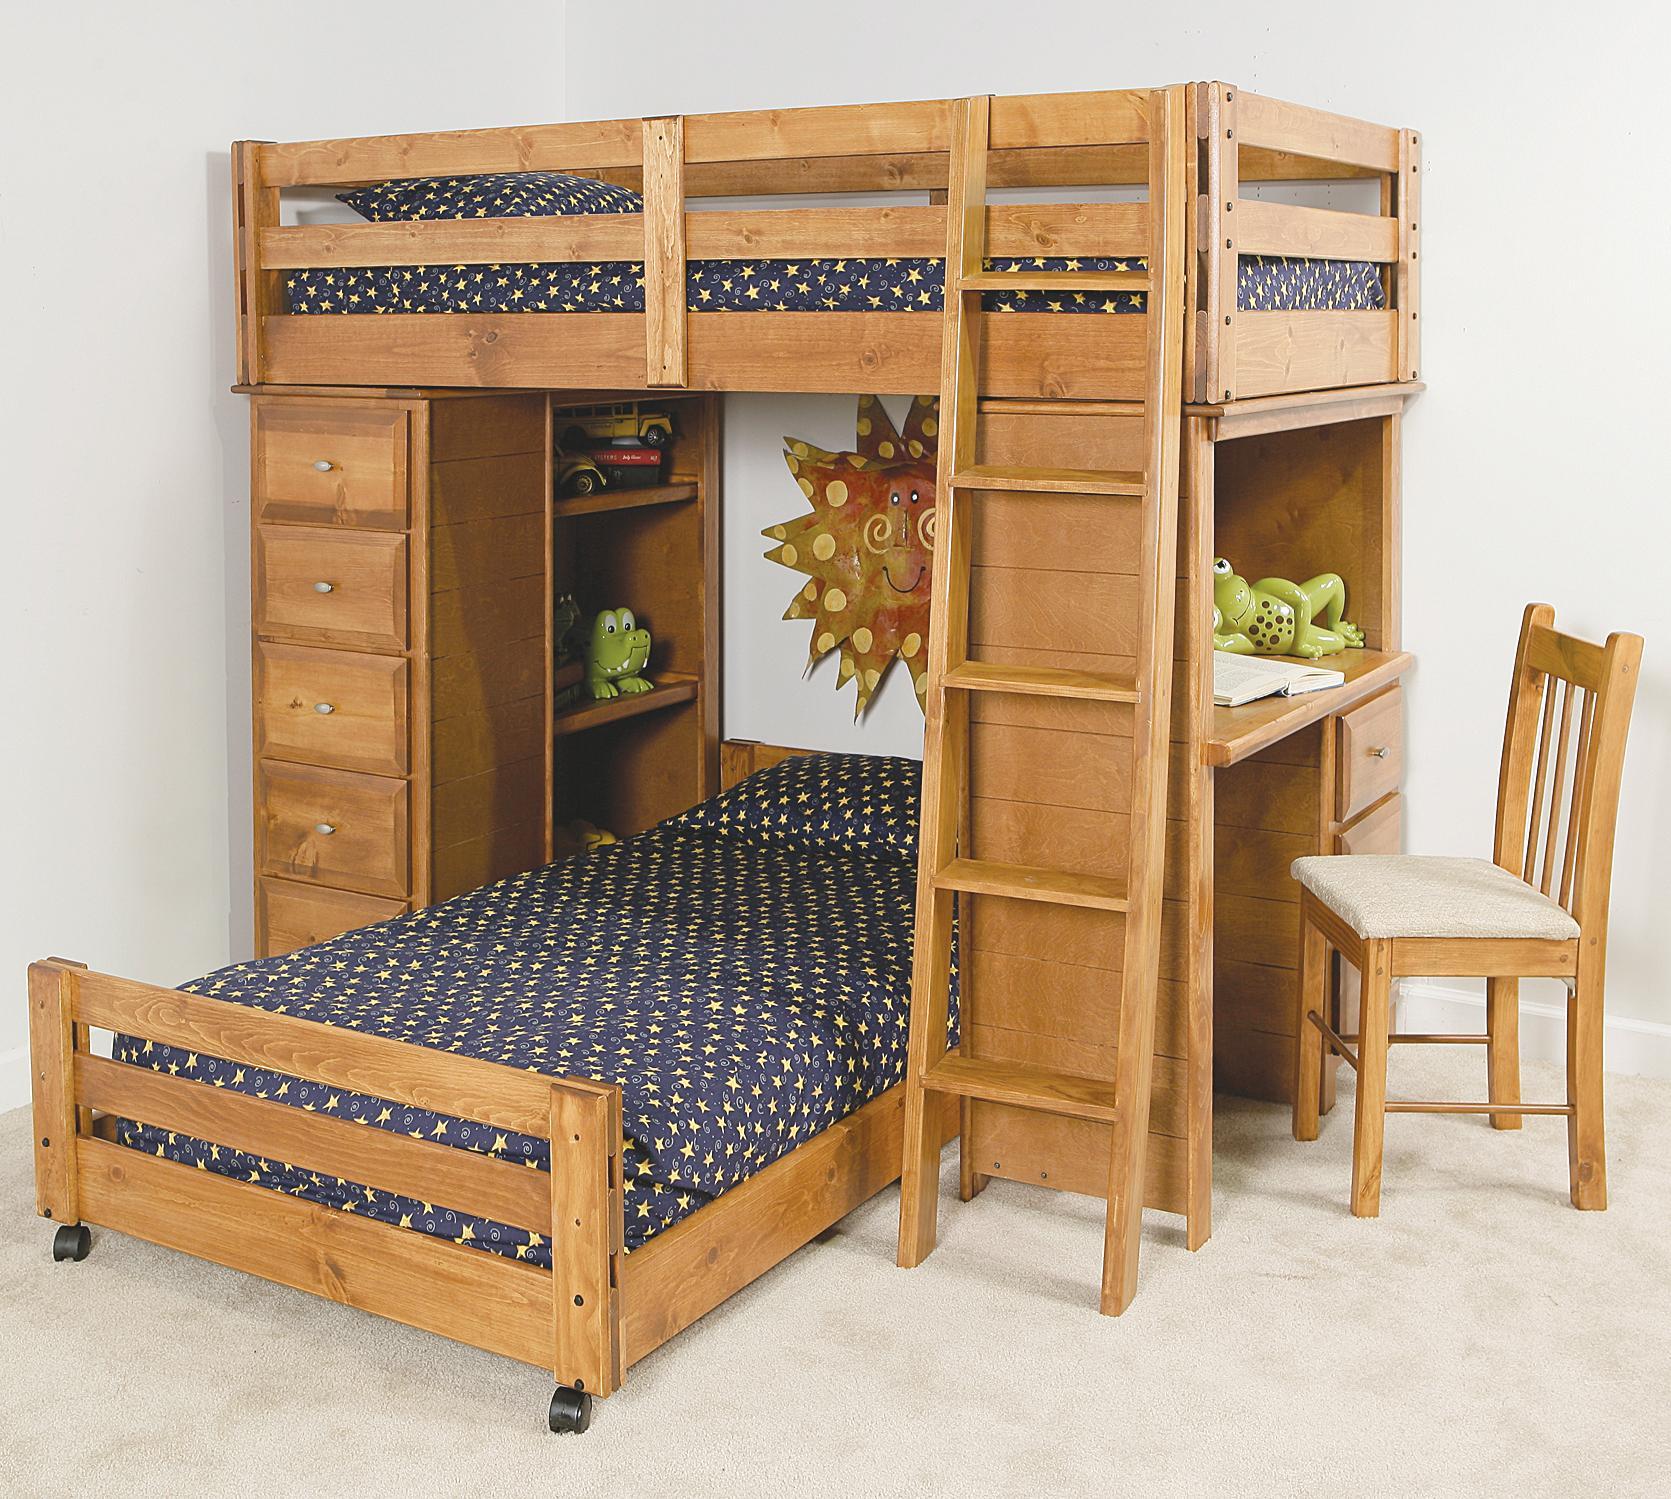 Images Furnituredealer Net Img Collections 2ftrend